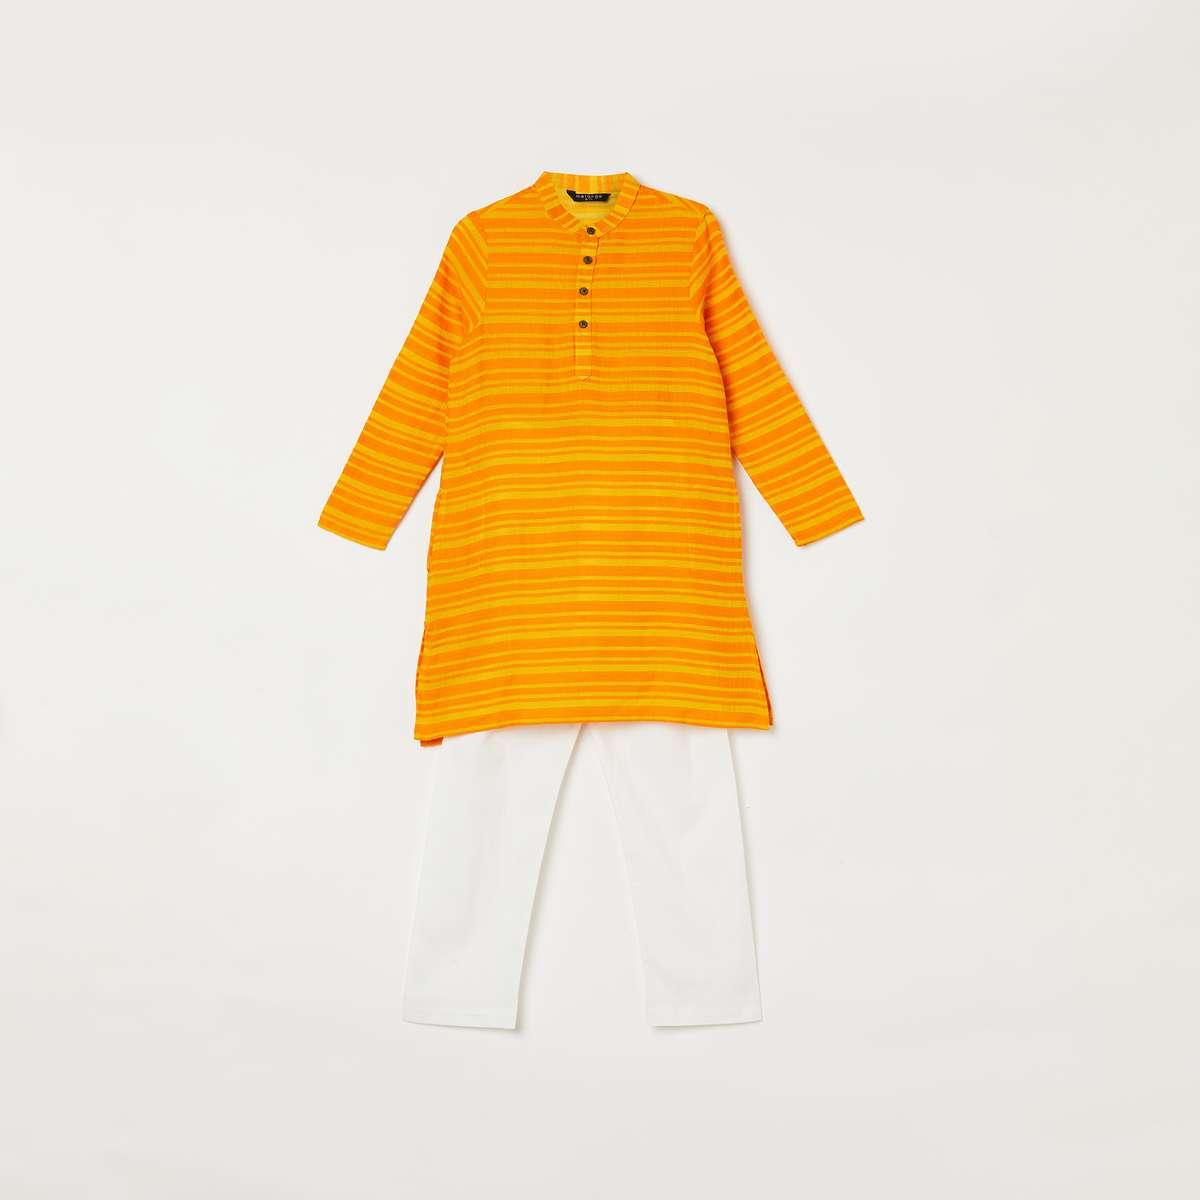 6.MELANGE Boys Striped Band Collar Kurta with Elasticated Waist Pyjamas